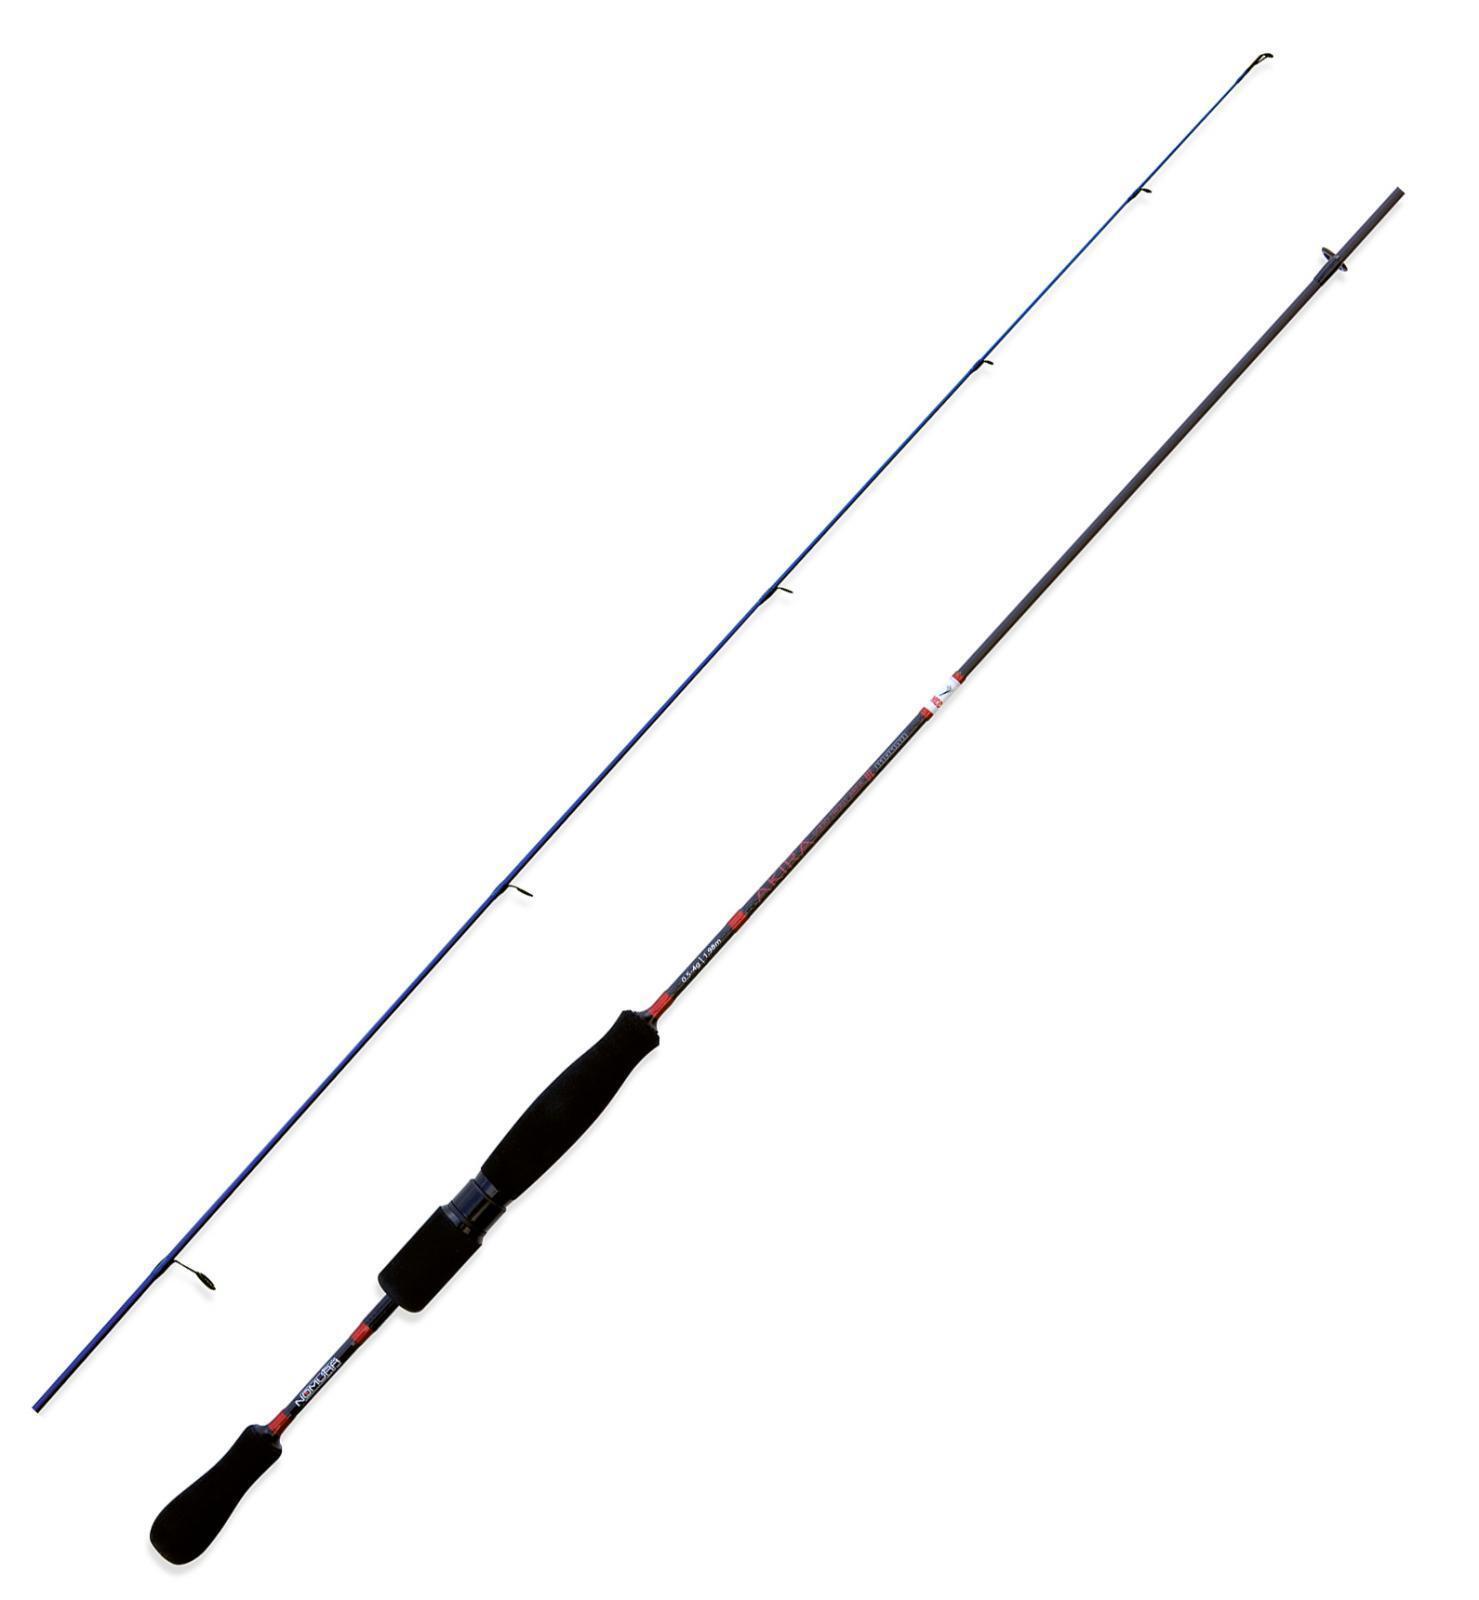 NM20520418 Nomura Canna pesca Trout Area Akira Solid 1,80cm  0,5-4 gr     CAS